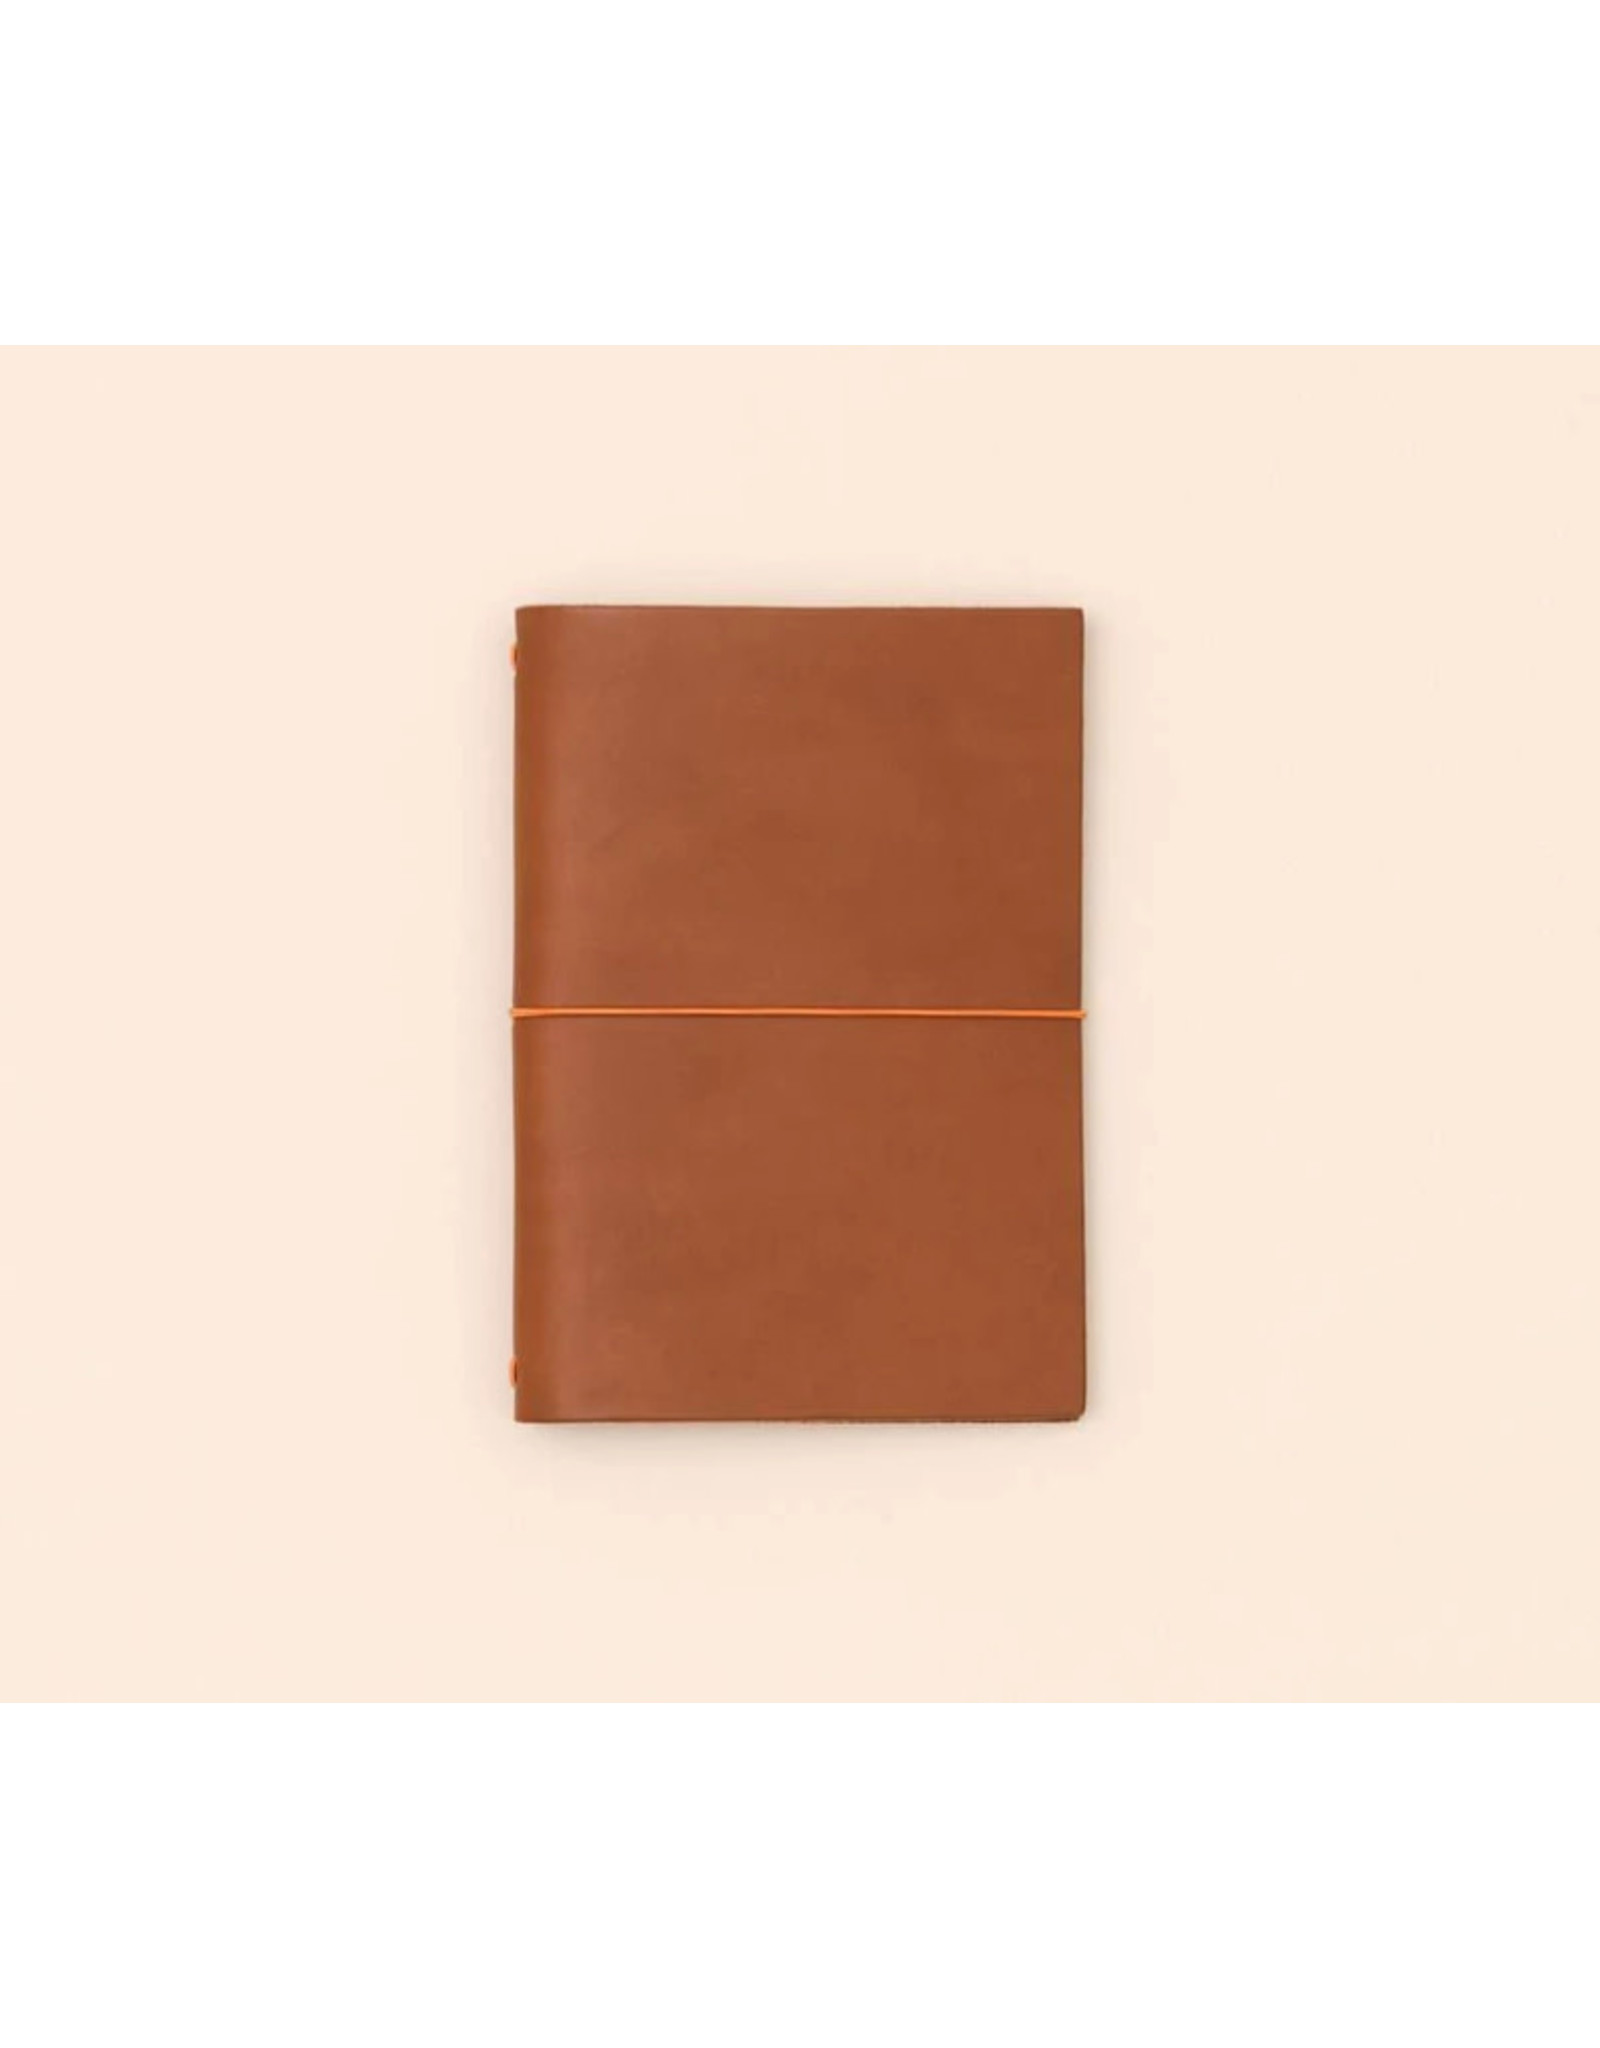 Paper republic Leather journal GSM  - Cognac -  8 x 15 -  with notebook 7  x 14 - Oranje rekker